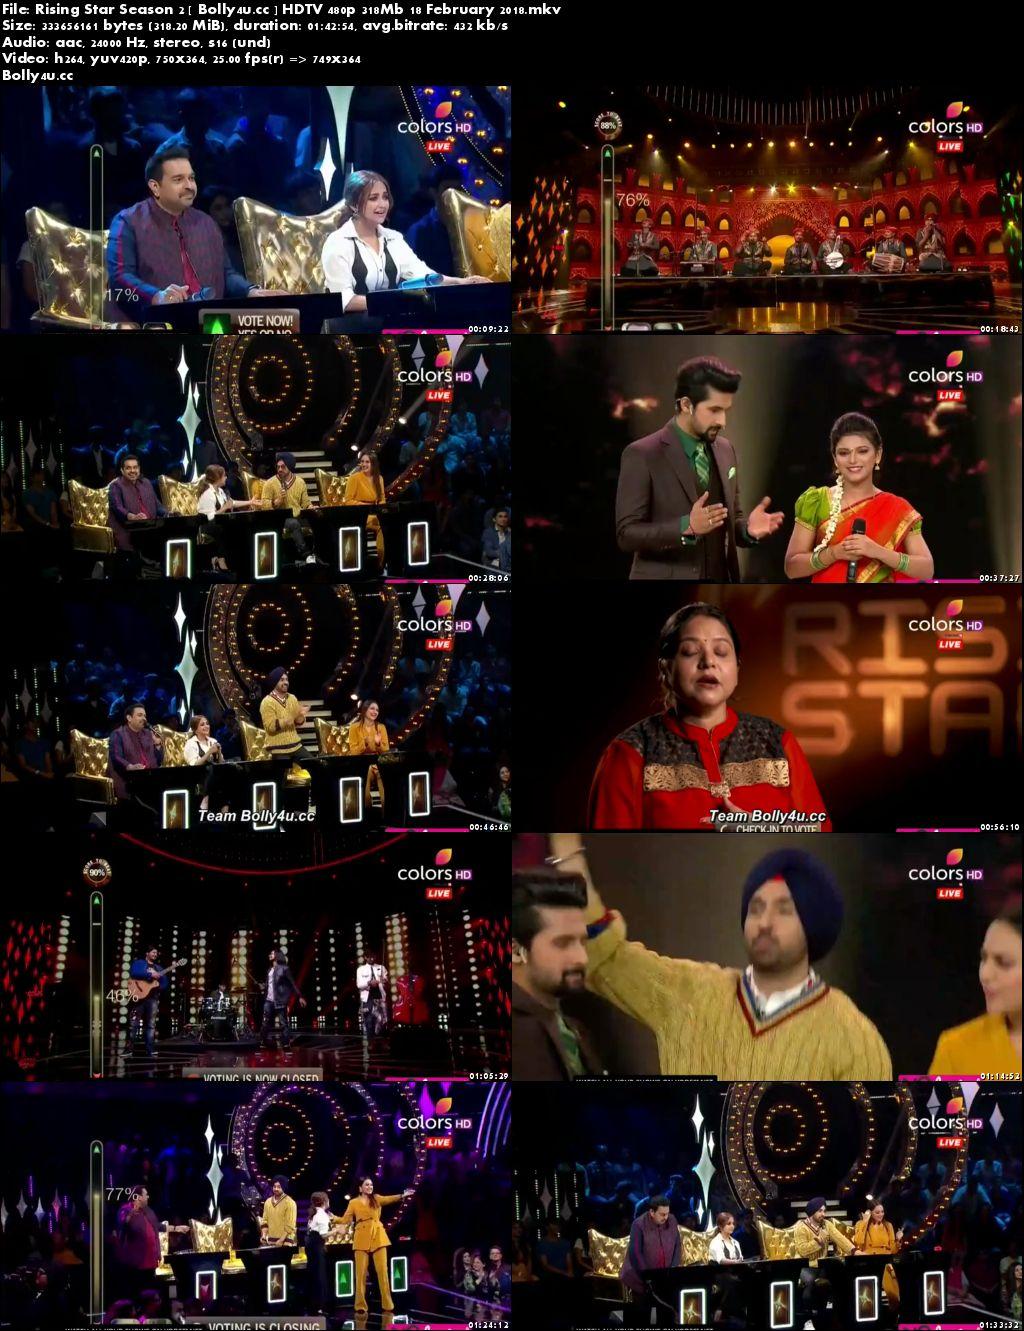 Rising Star Season 2 HDTV 480p 300Mb 18 February 2018 Download